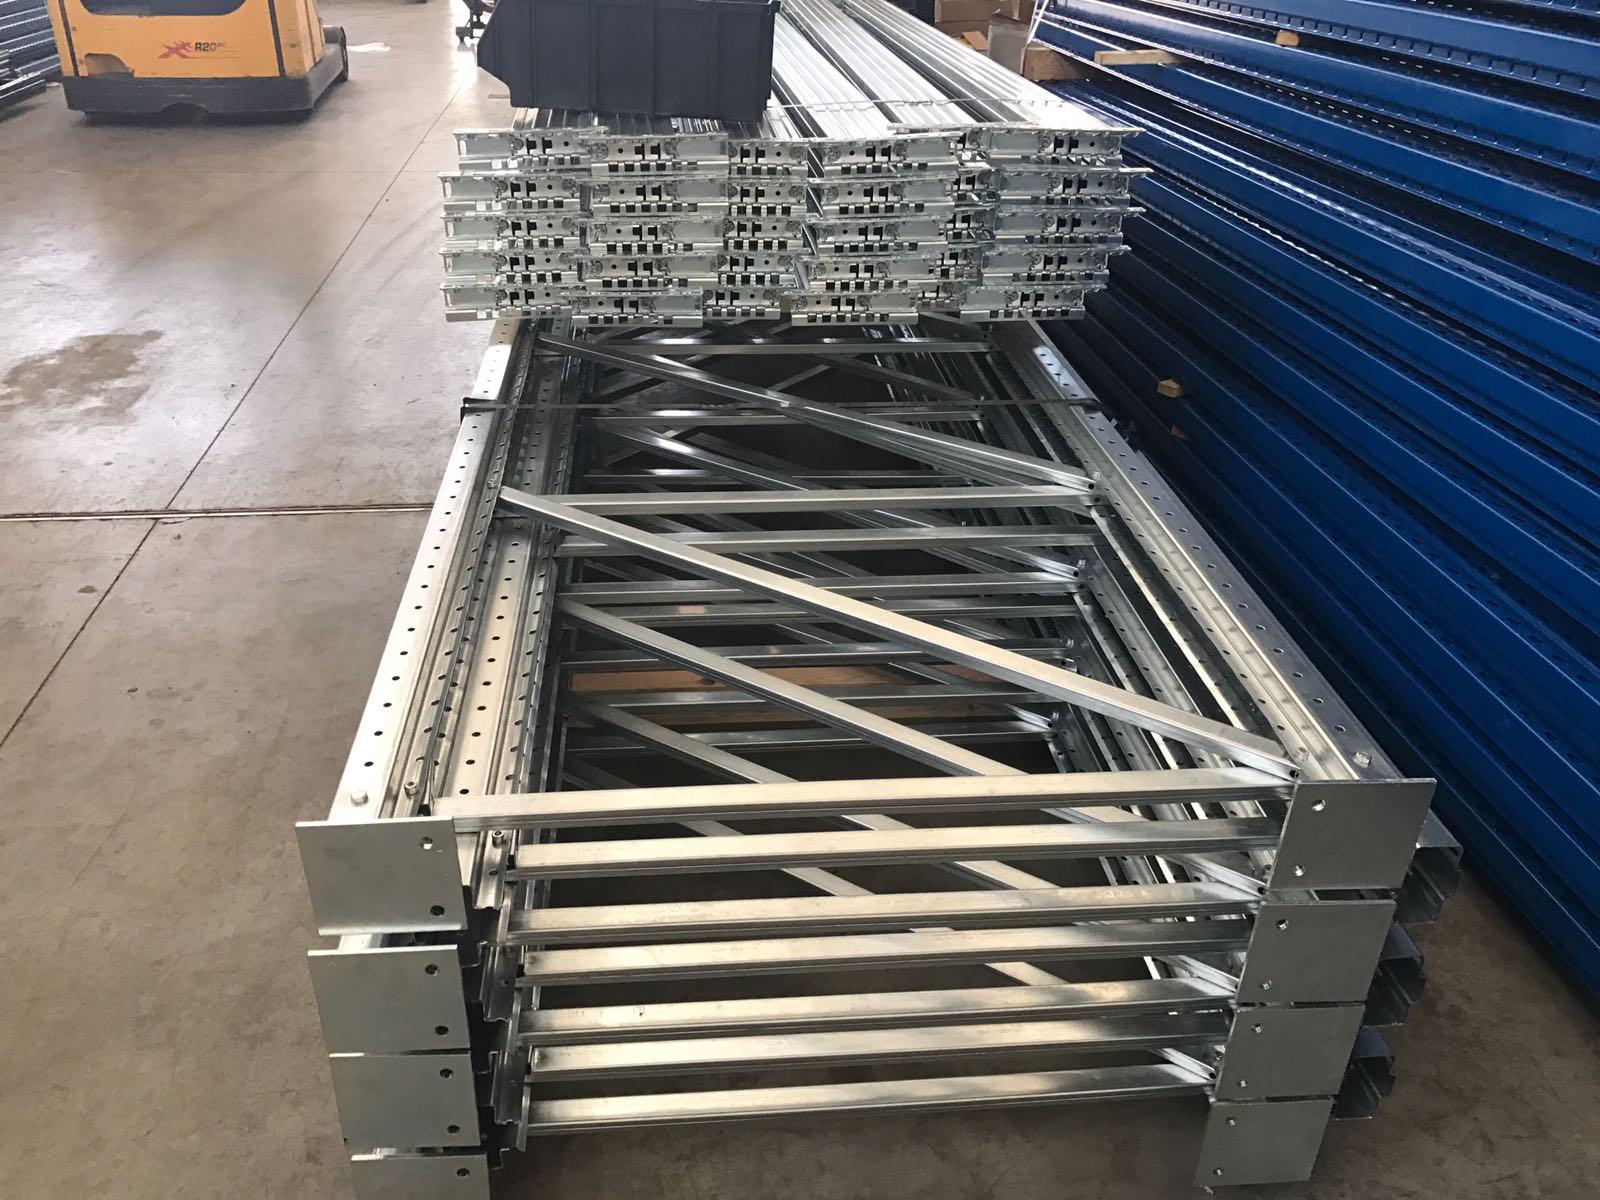 Scaffalature Industriali Modulblok.Scaffalature Portapallet H4 L6 18 Posti Pallet Portata 1000kg Bancale